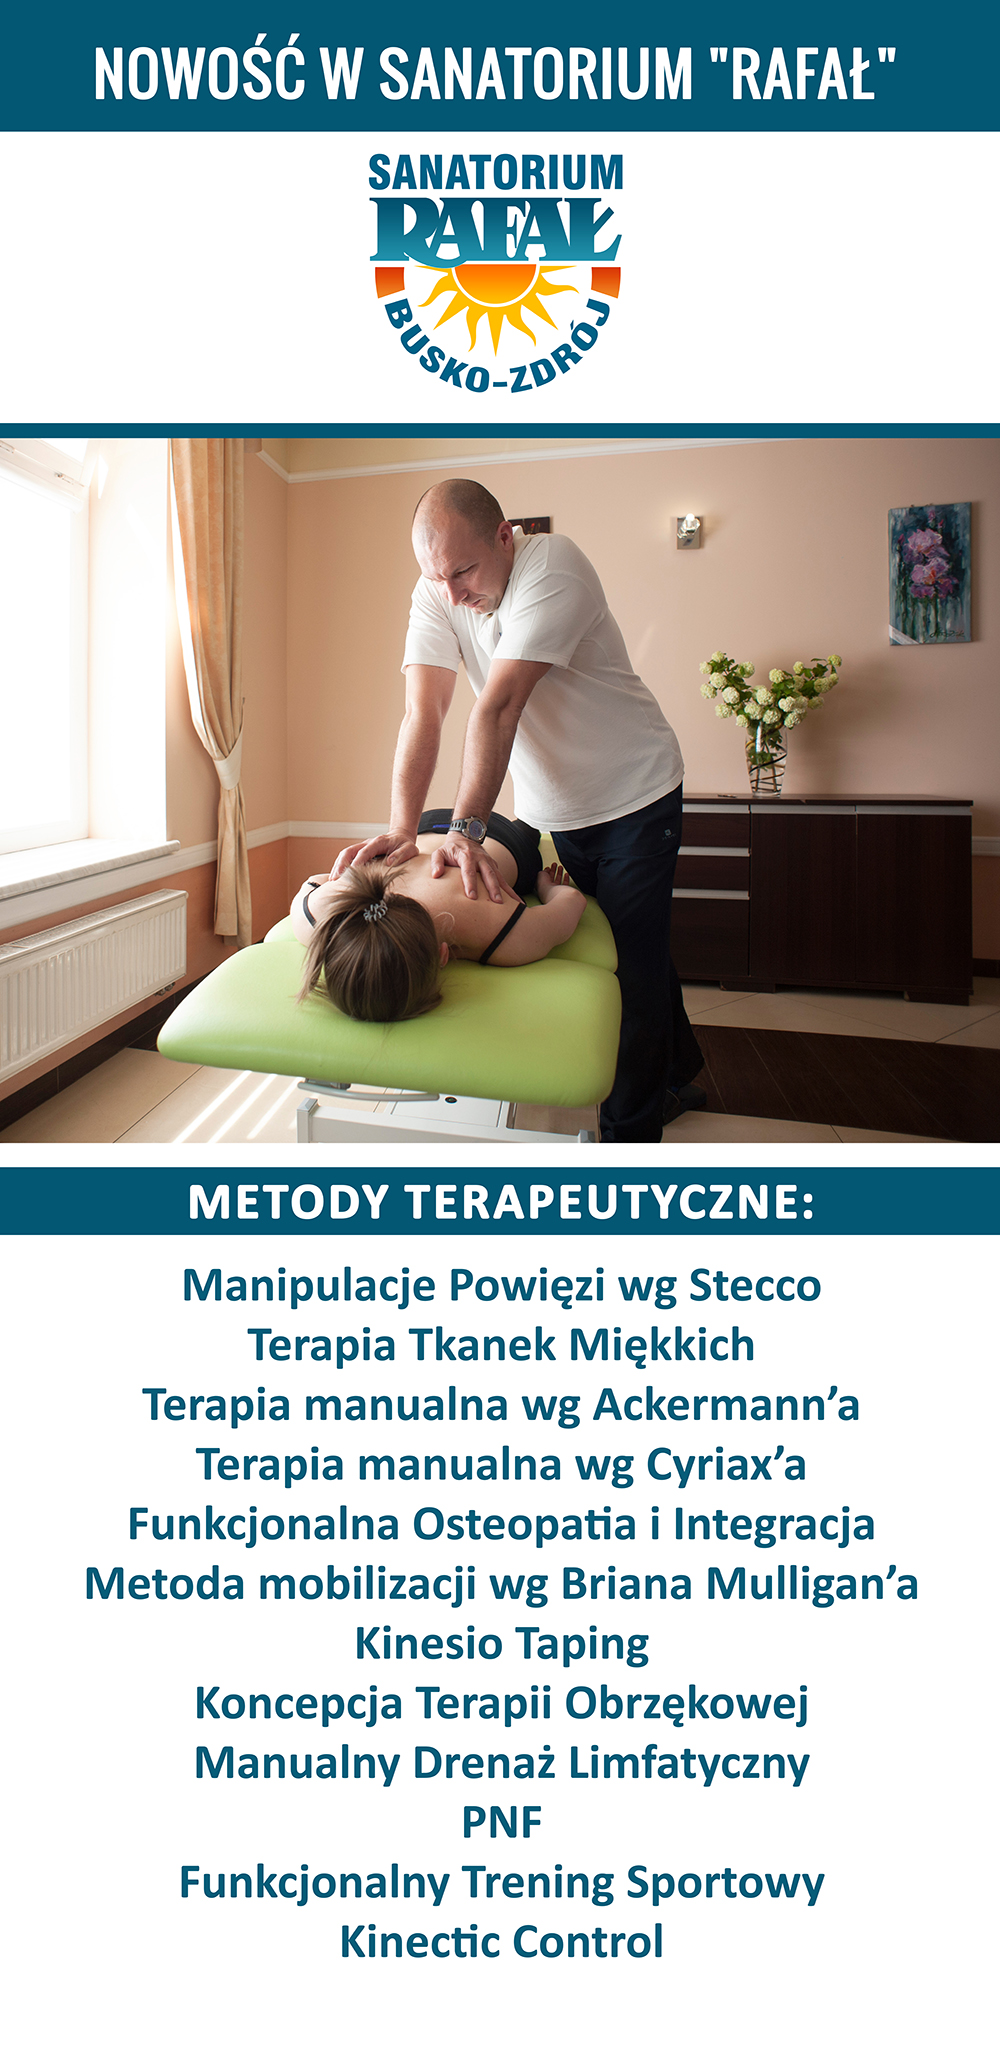 Terapia_manualna.jpg